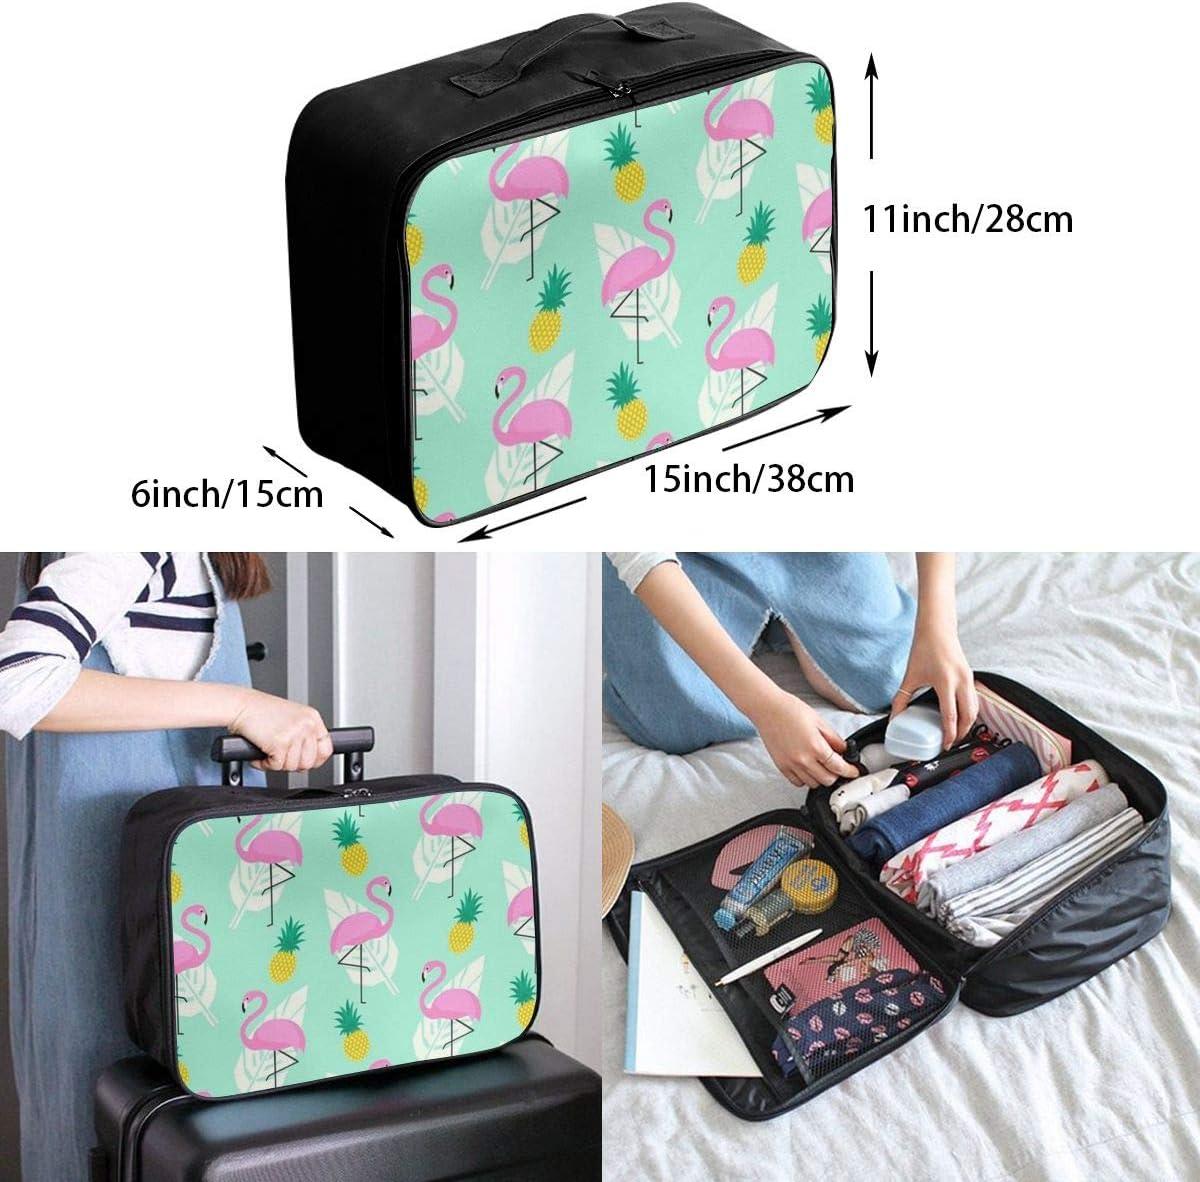 Pink Flamingo Travel Carry-on Luggage Weekender Bag Overnight Tote Flight Duffel In Trolley Handle